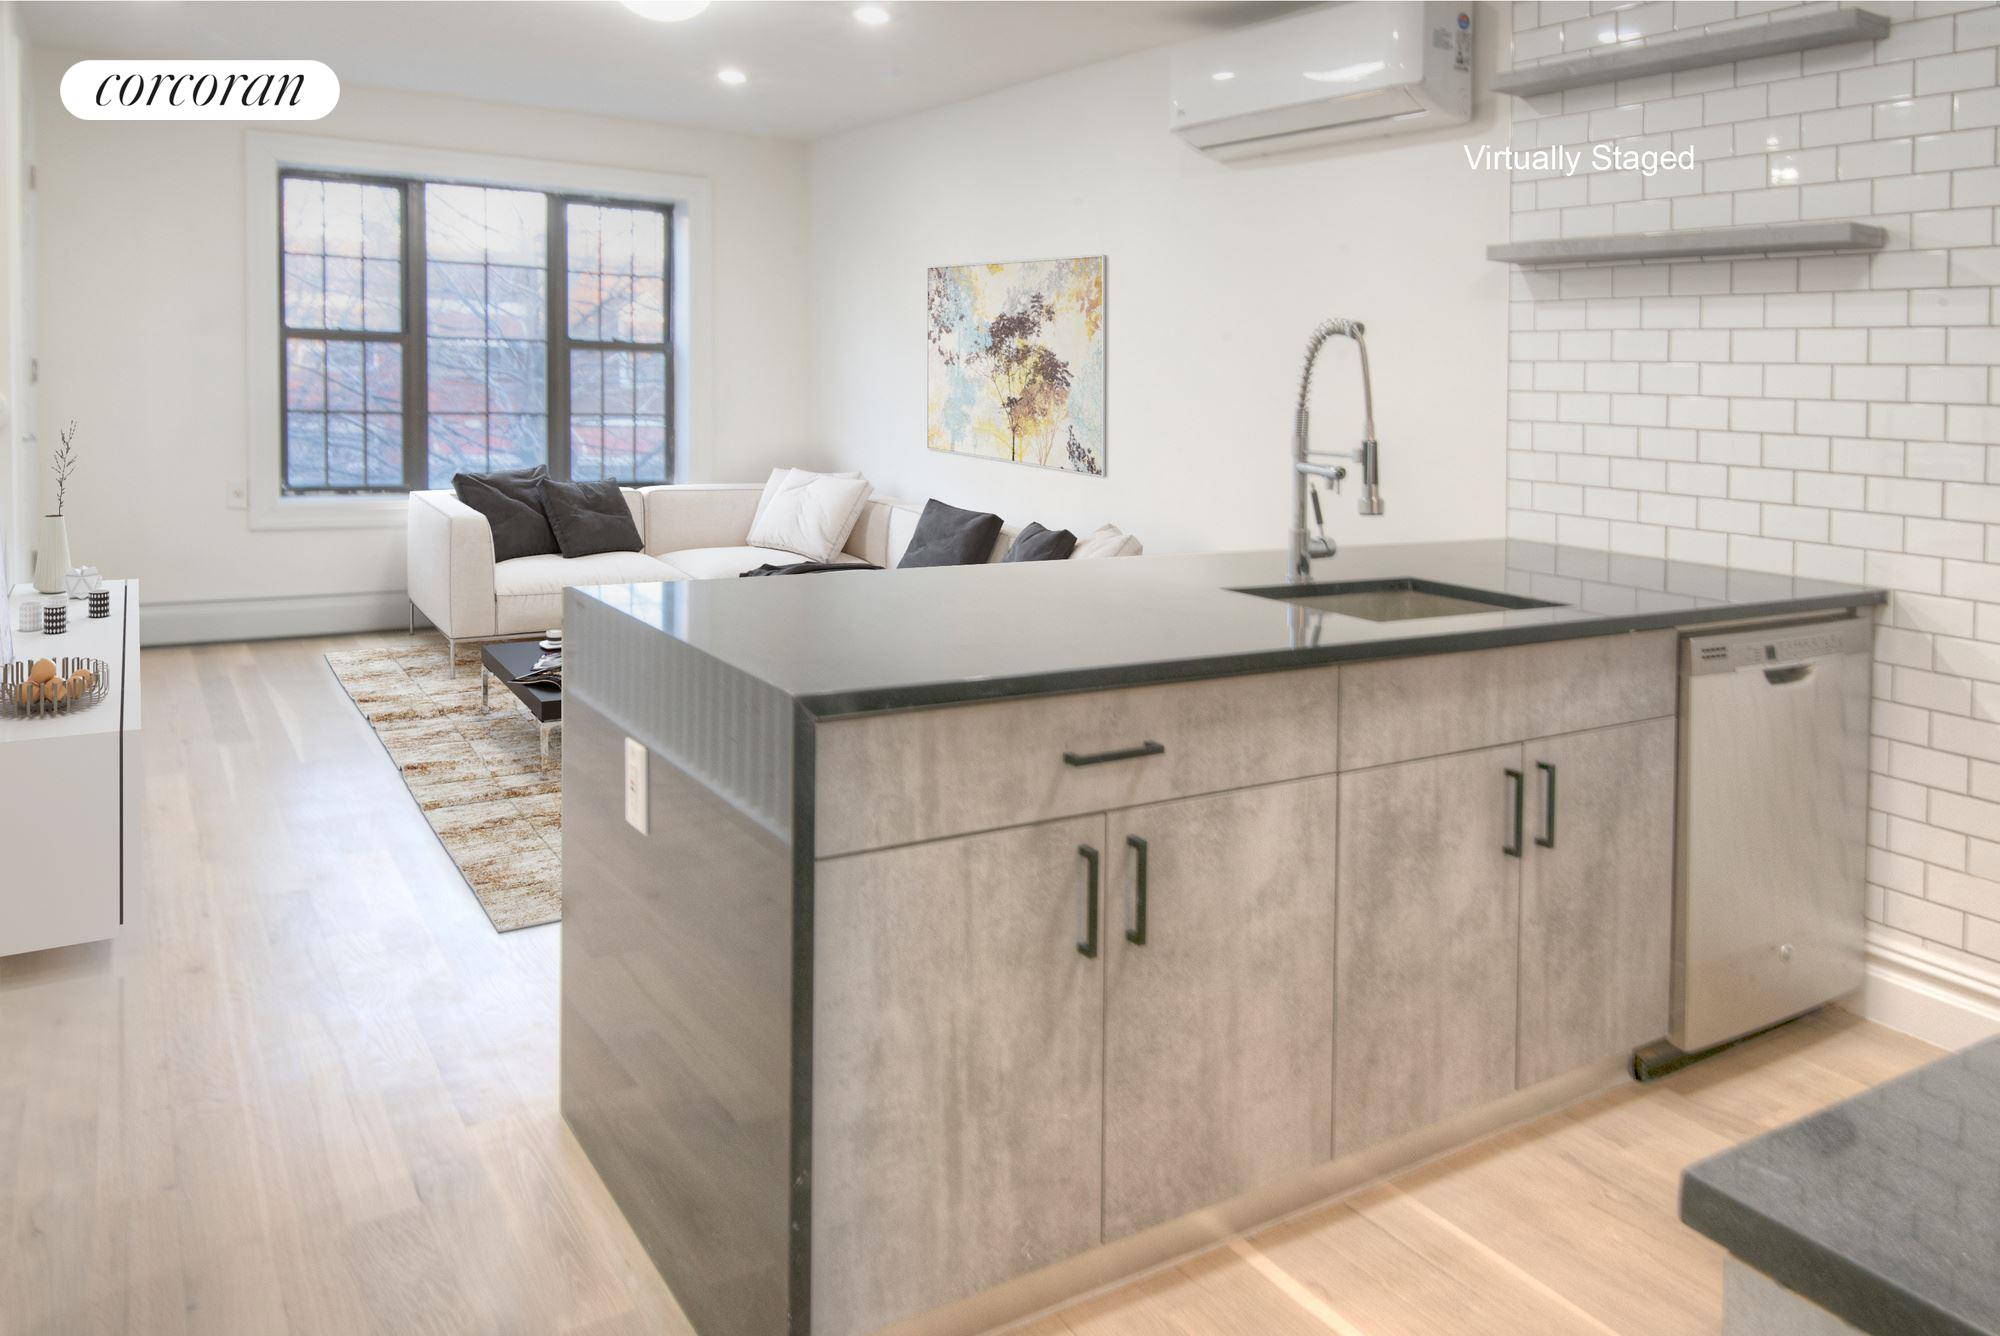 Corcoran, 1281 DeKalb Avenue, Bushwick Real Estate, Brooklyn For ...